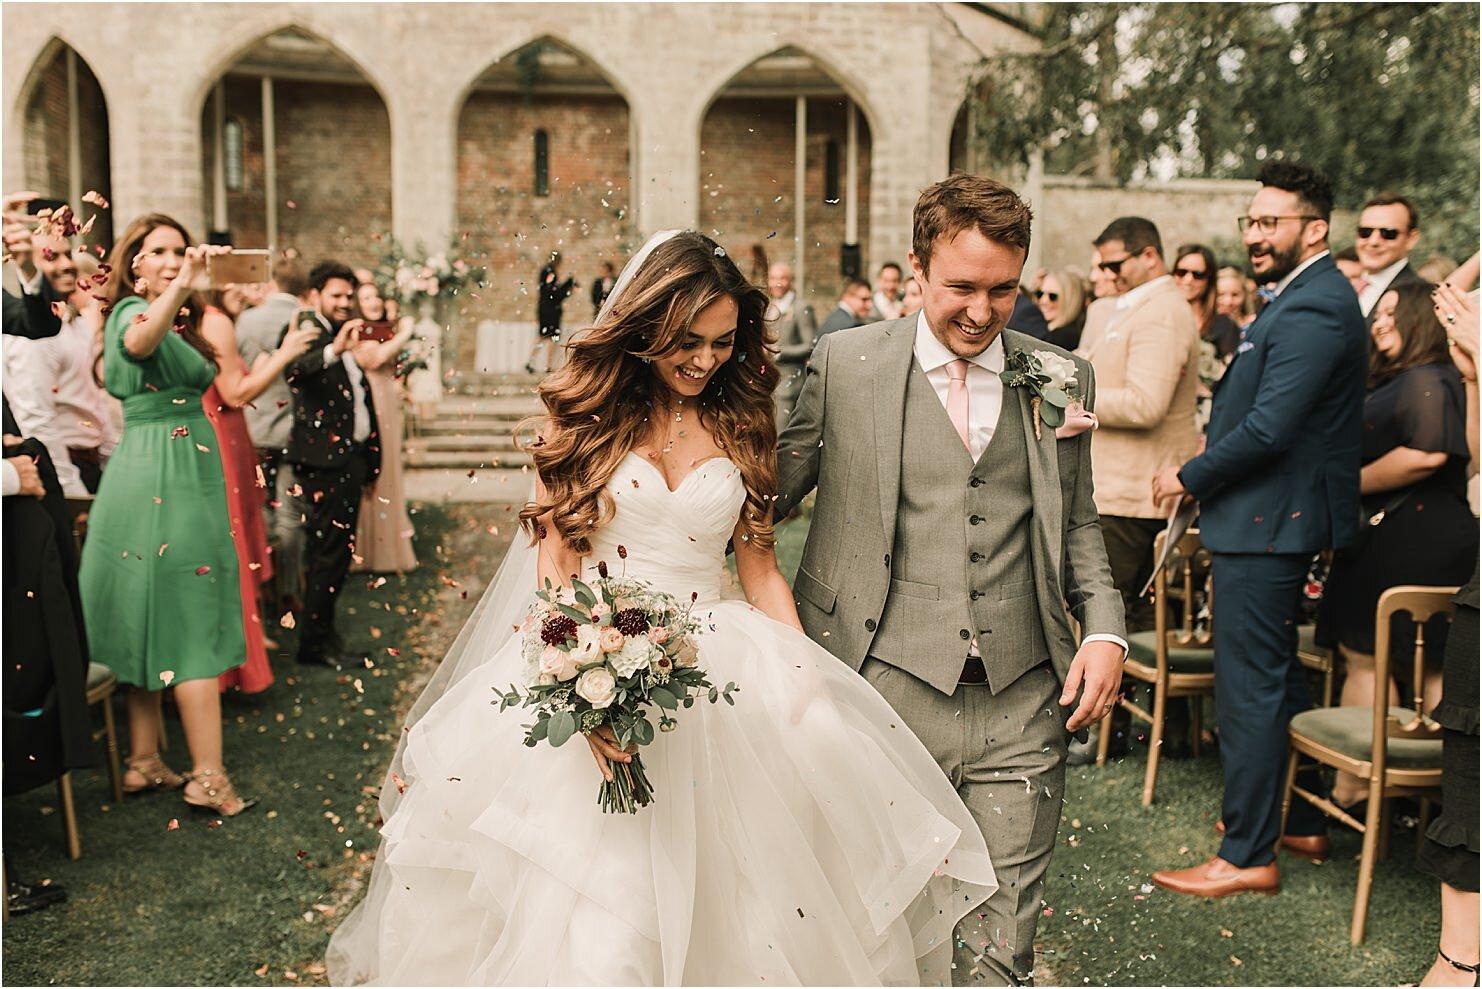 boda-de-cuento-en-castillo-boda-en-londres-58.jpg